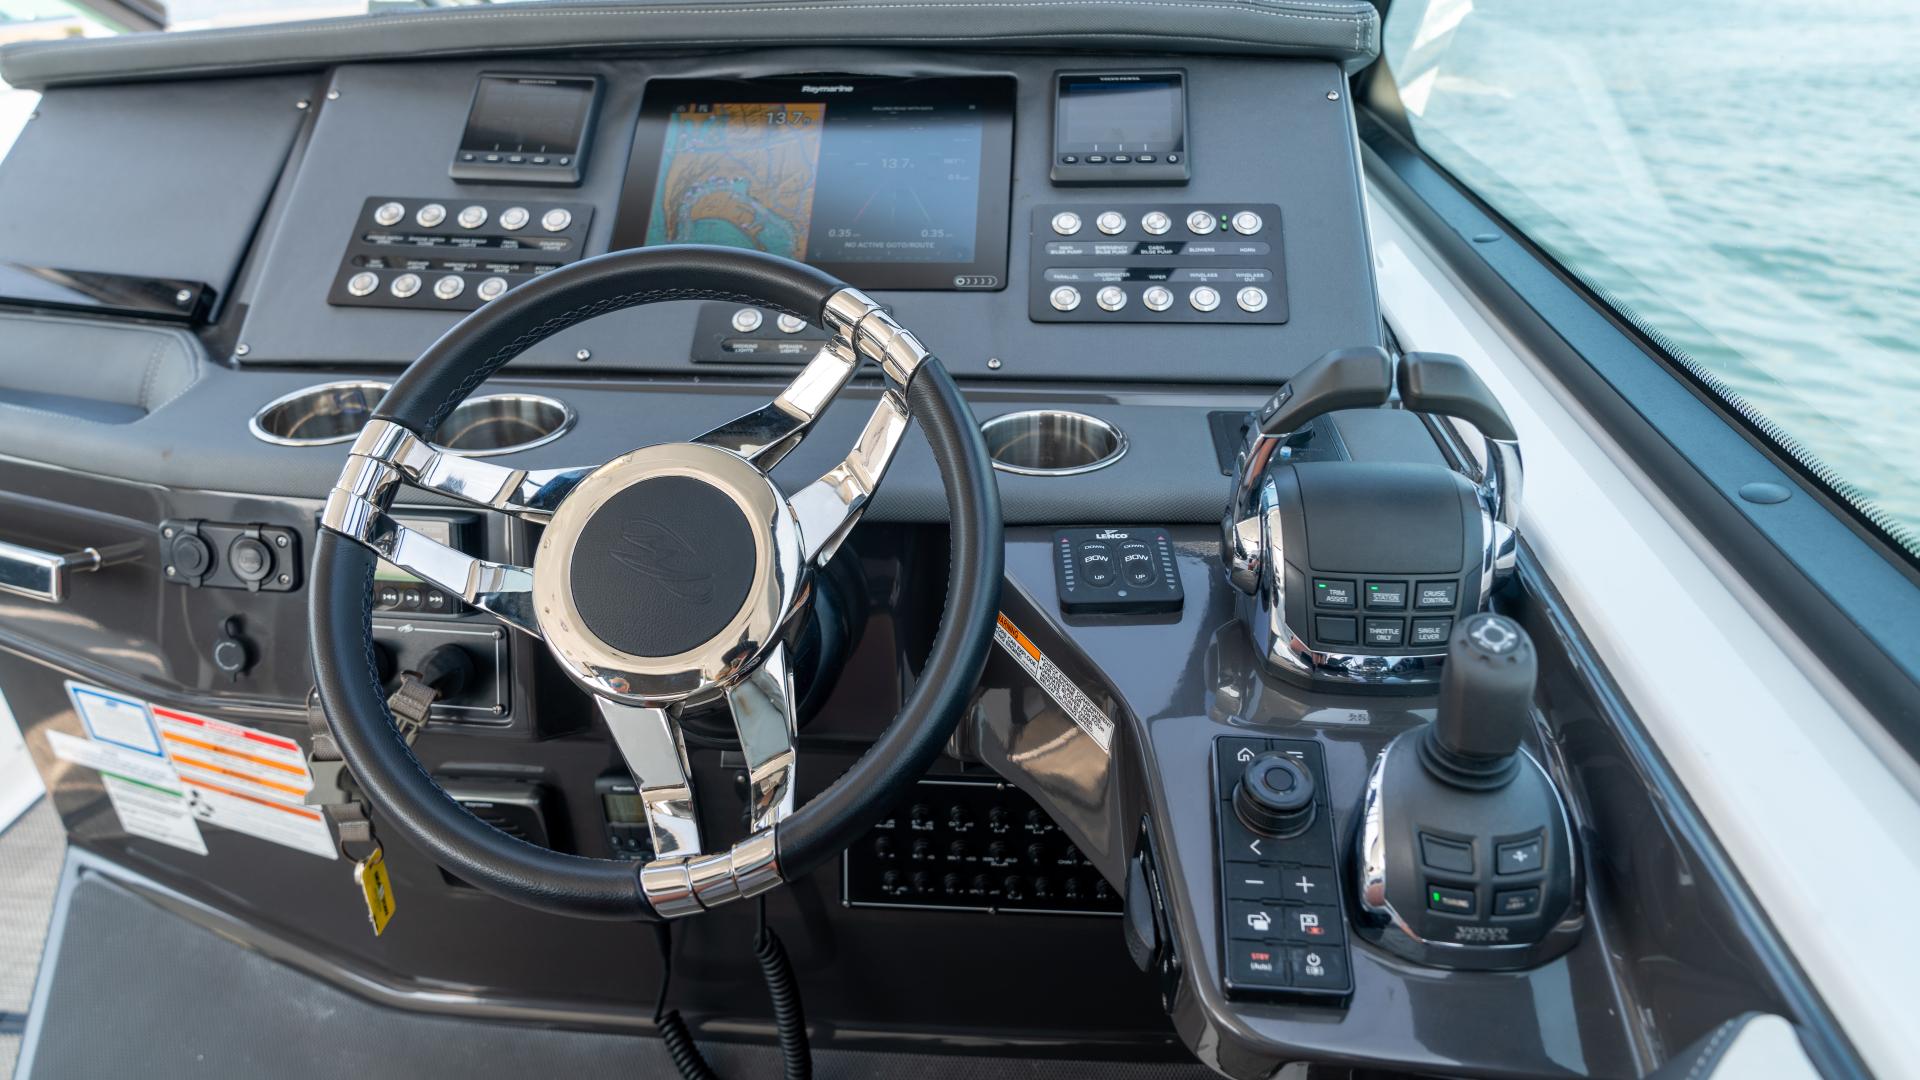 Monterey-378SE 2019-MATONE IV California-United States-HELM-1511134   Thumbnail